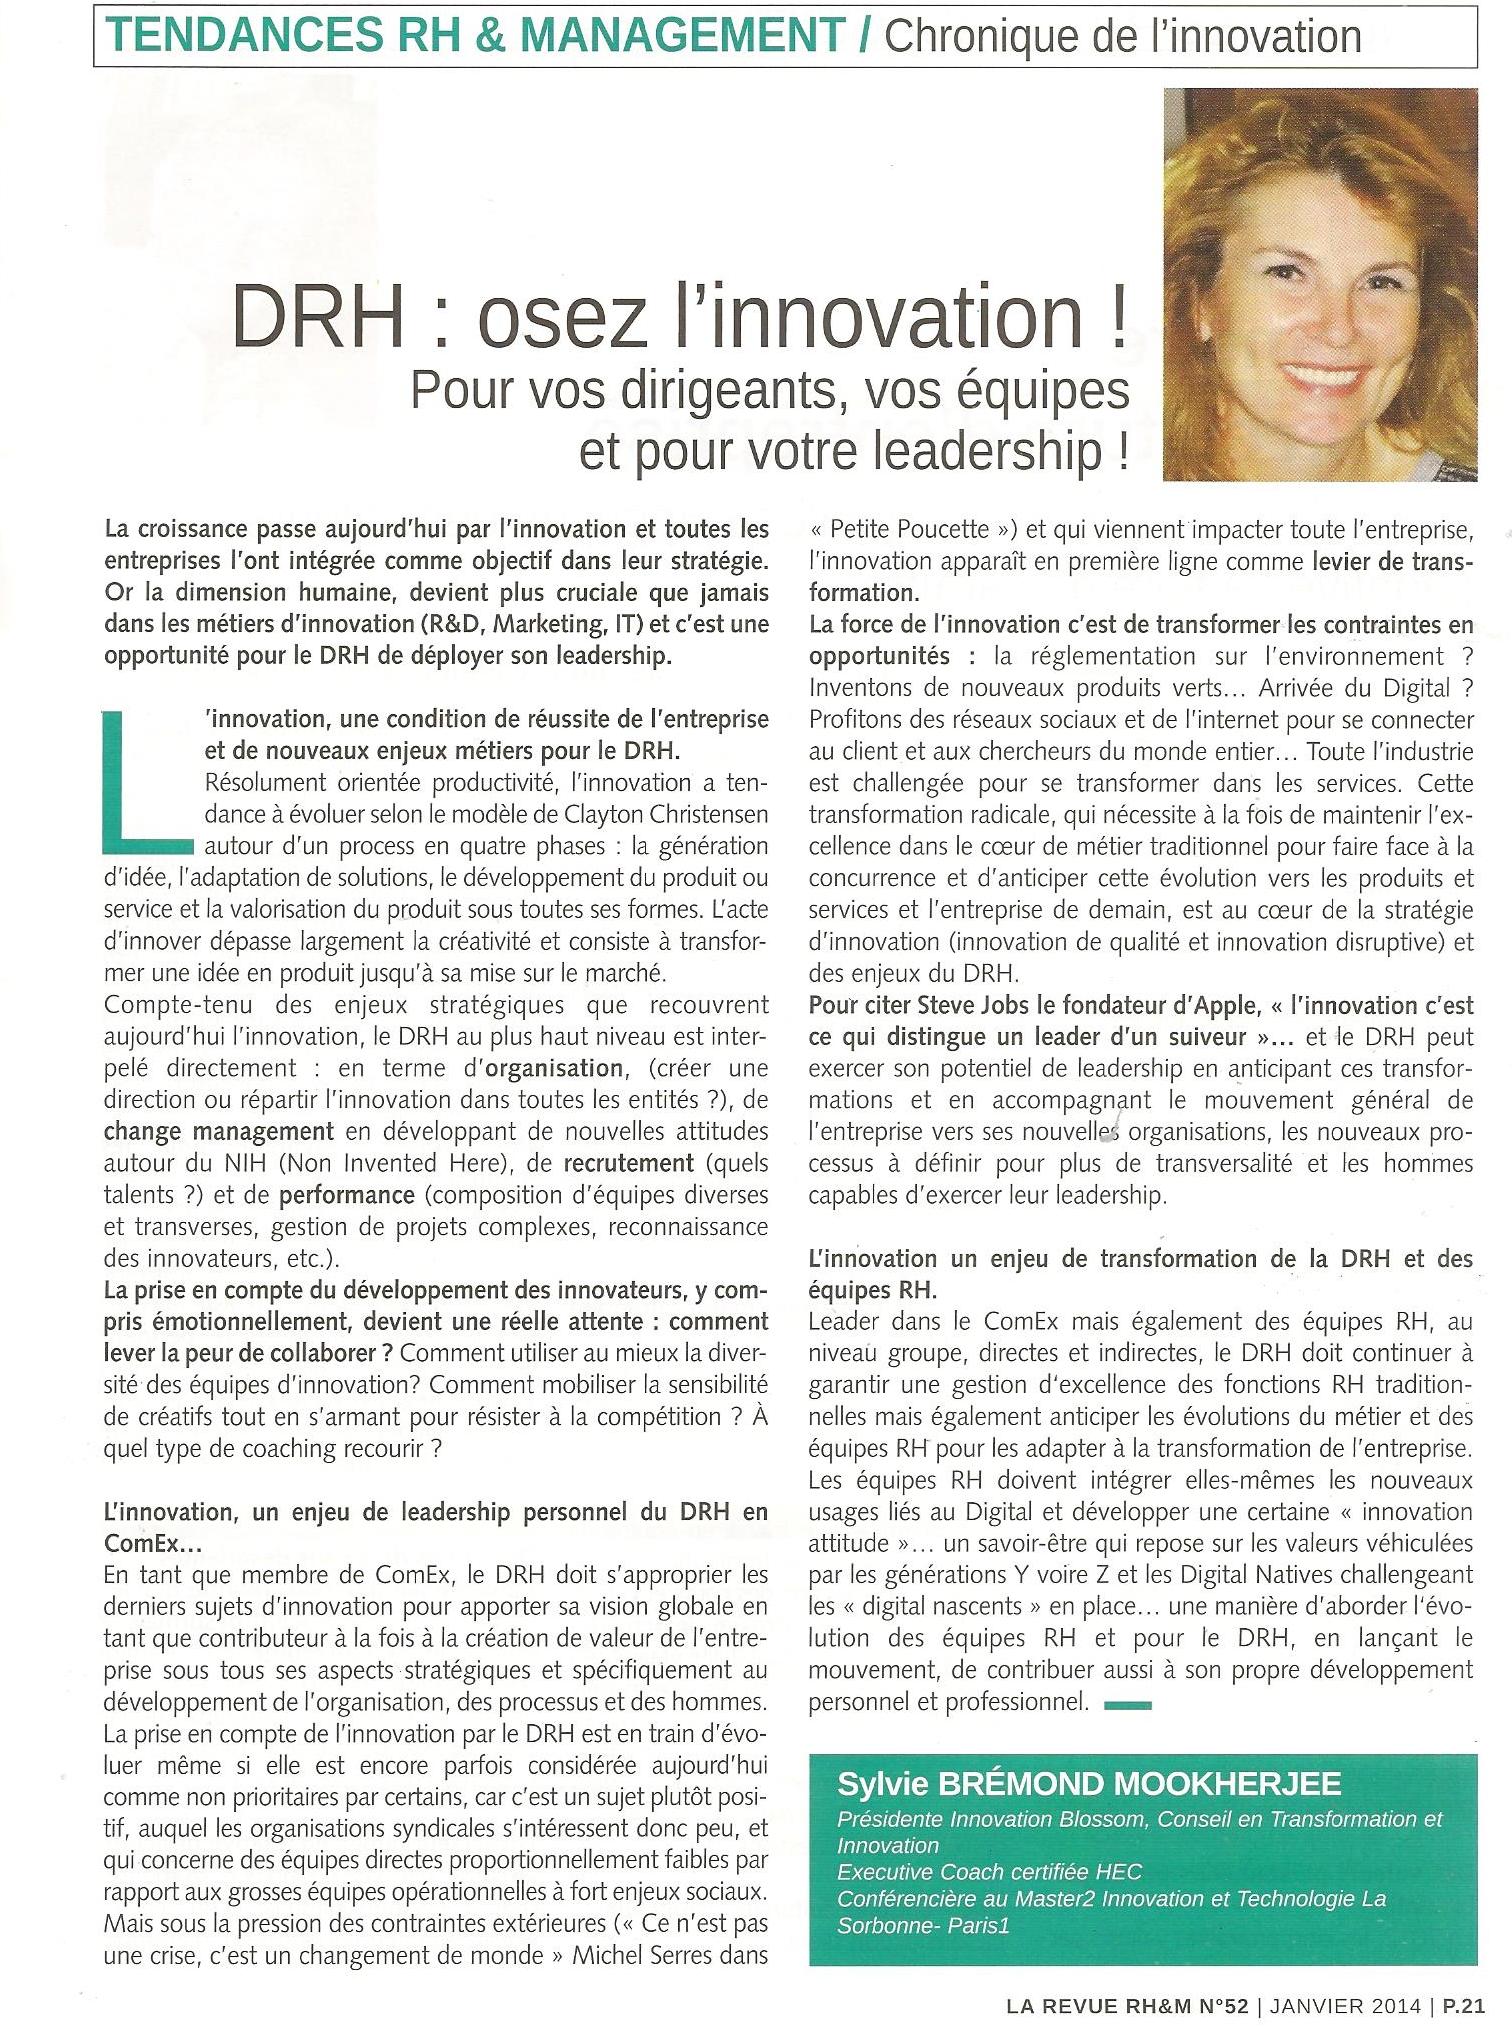 drh osez innovation revue rh&m sylvie bremond